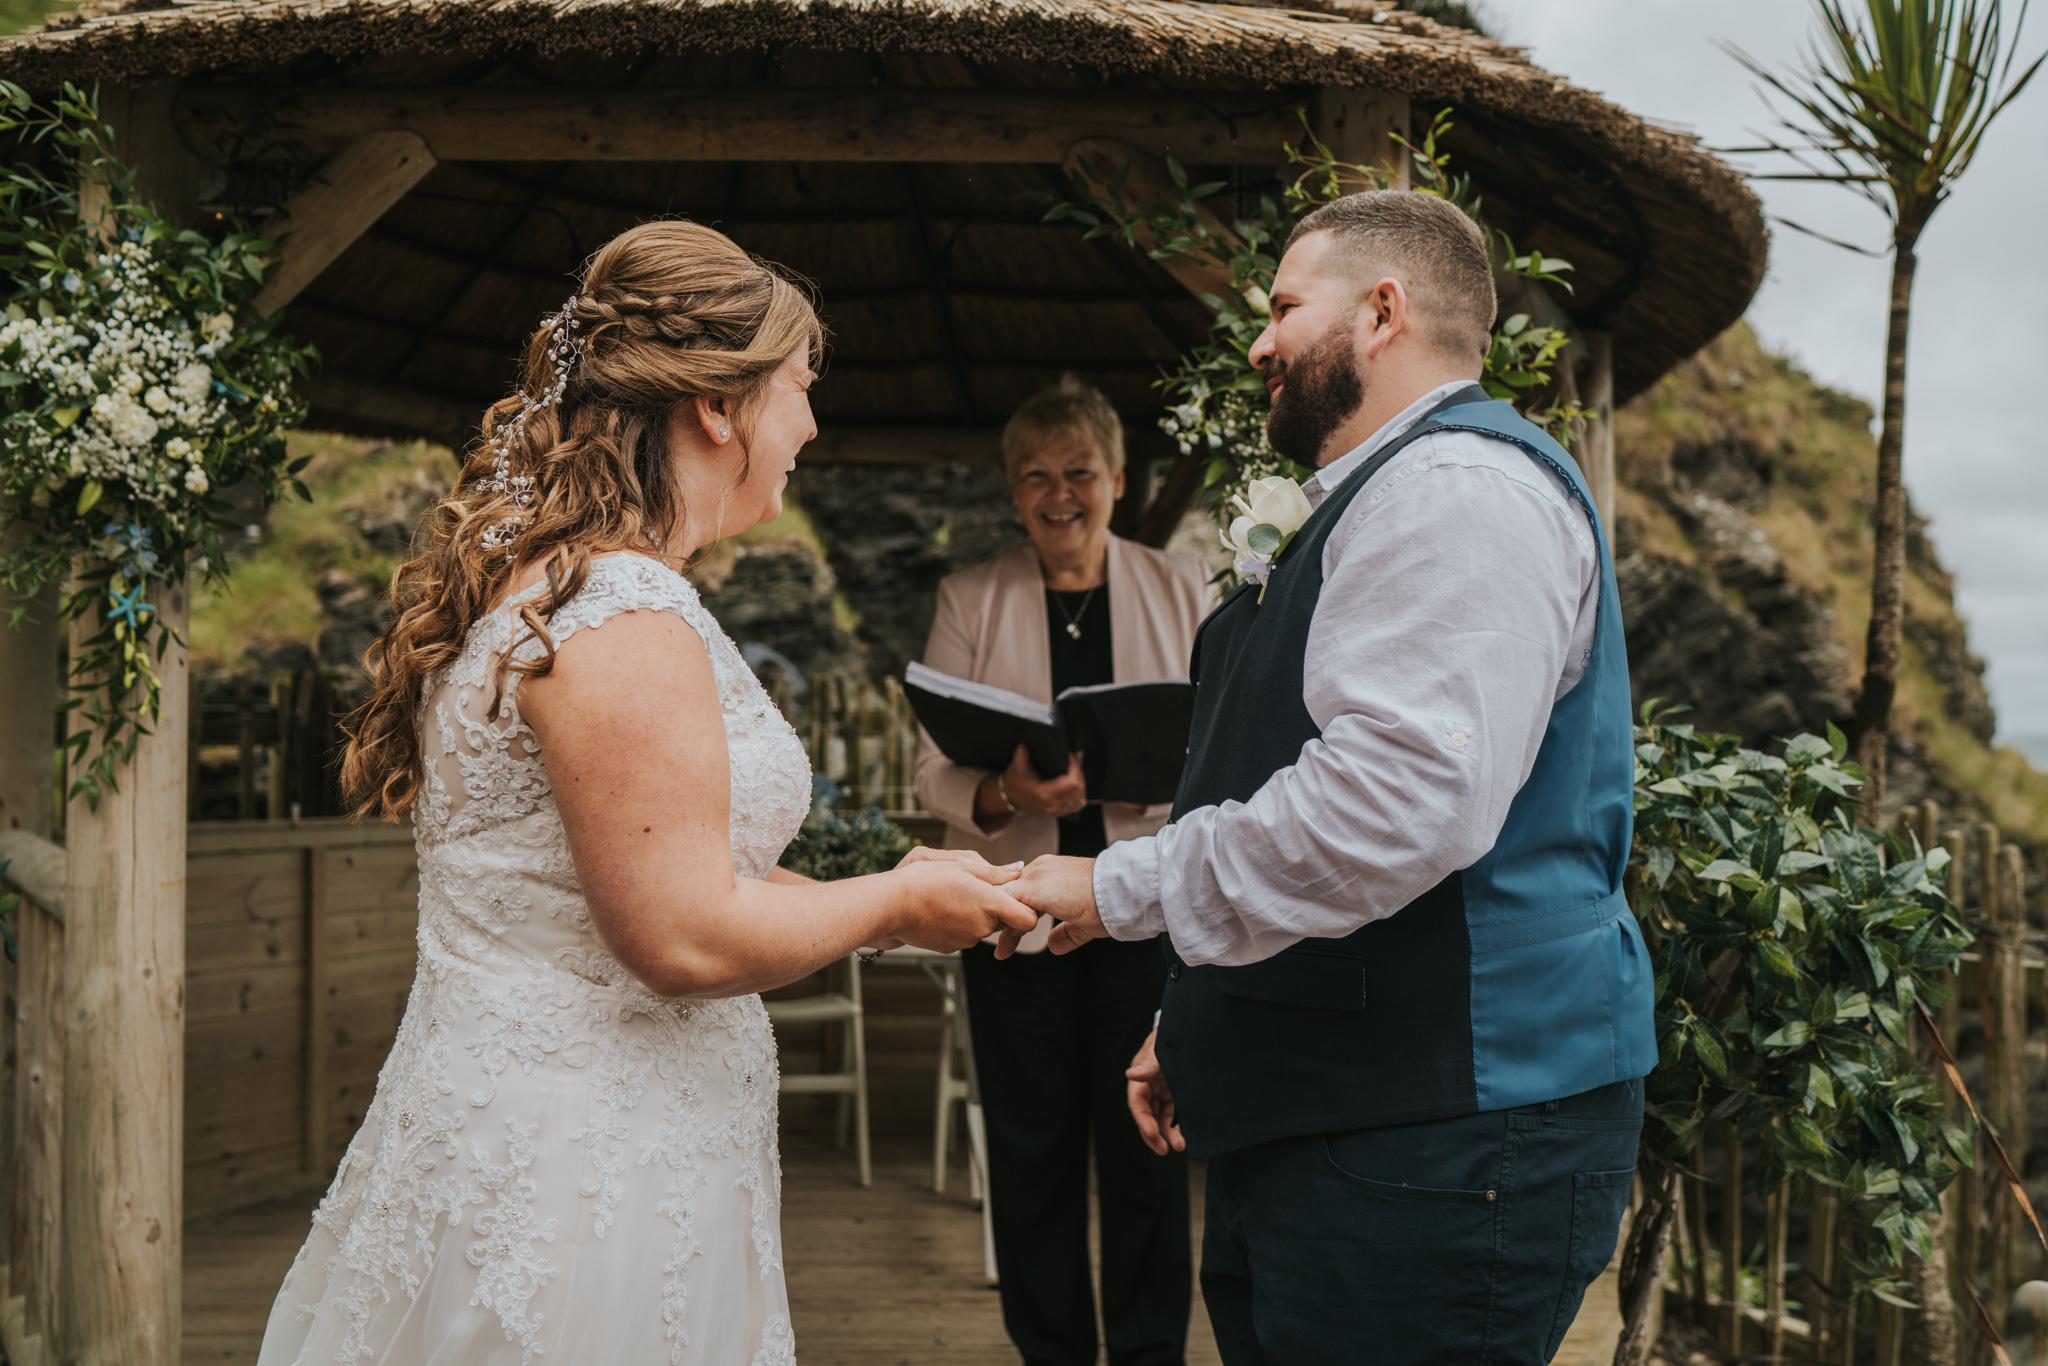 john-amy-relaxed-beach-wedding-tunnels-beaches-ilfracombe-north-devon-grace-elizabeth-colchester-essex-alternative-relaxed-wedding-photography-devon-suffolk-norfolk-essex (62 of 159).jpg